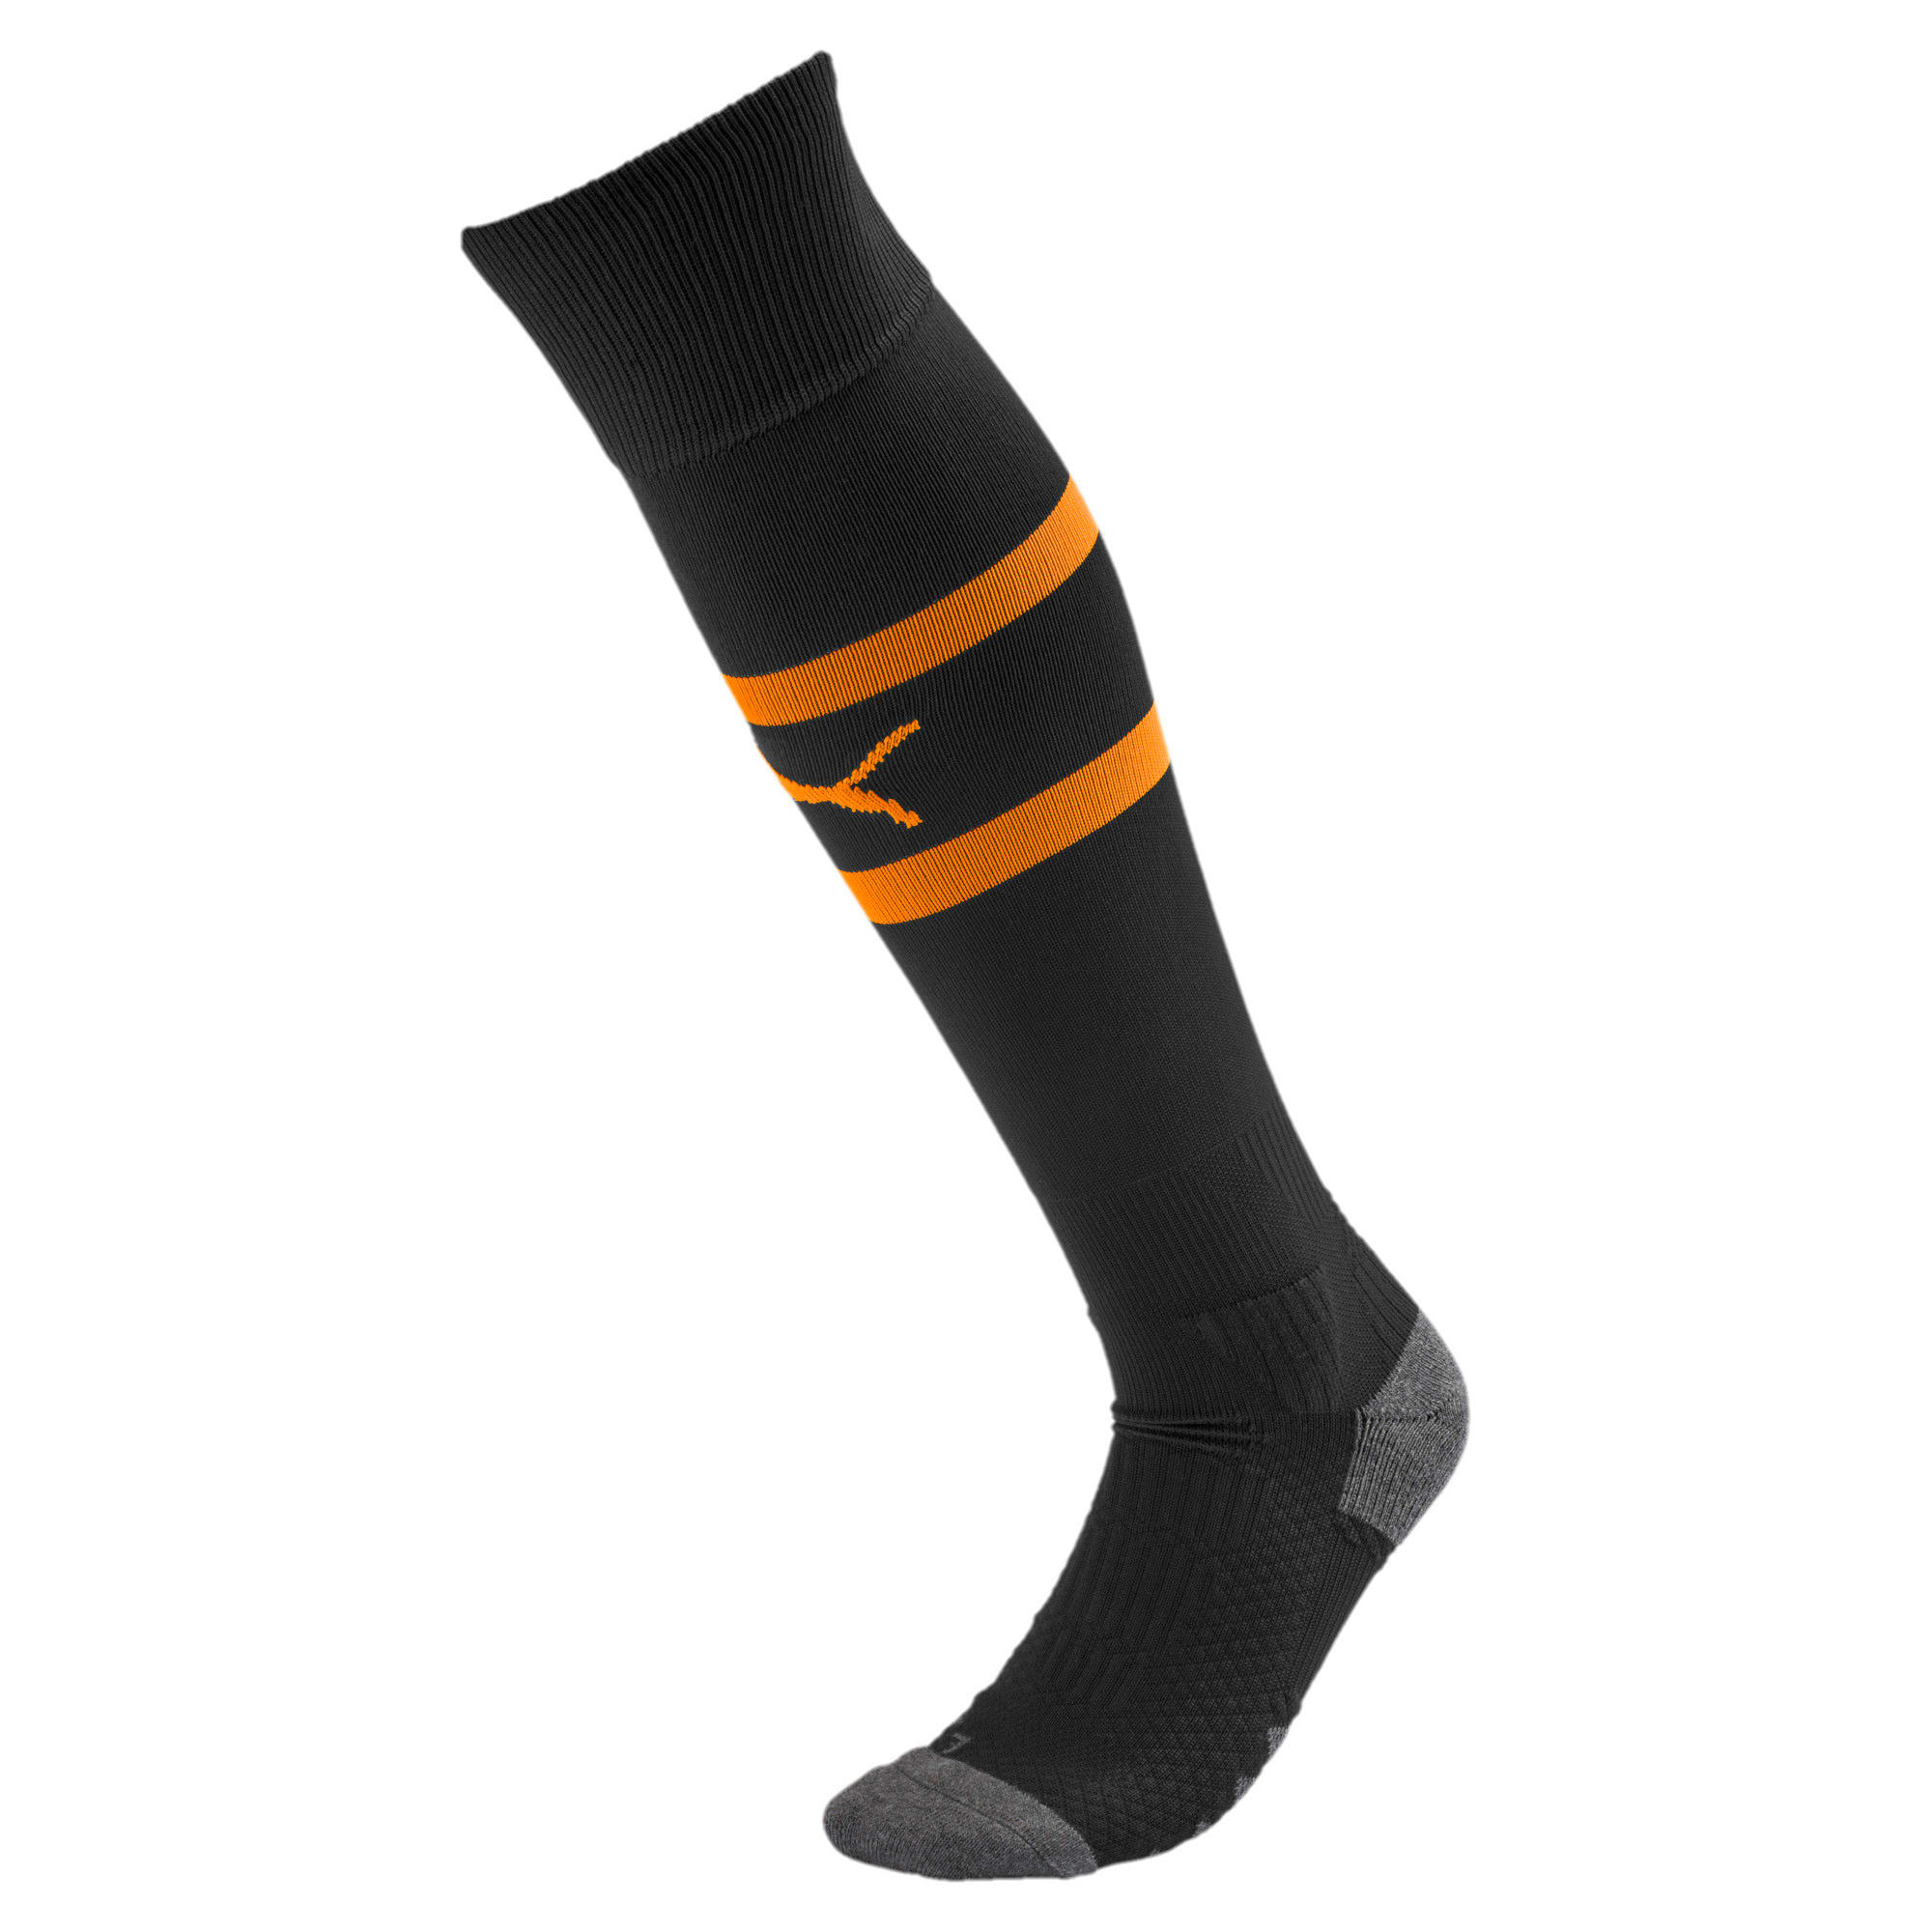 Thumbnail 1 of Olympique de Marseille Boys' Band Socks, Puma Black-Orange Popsicle, medium